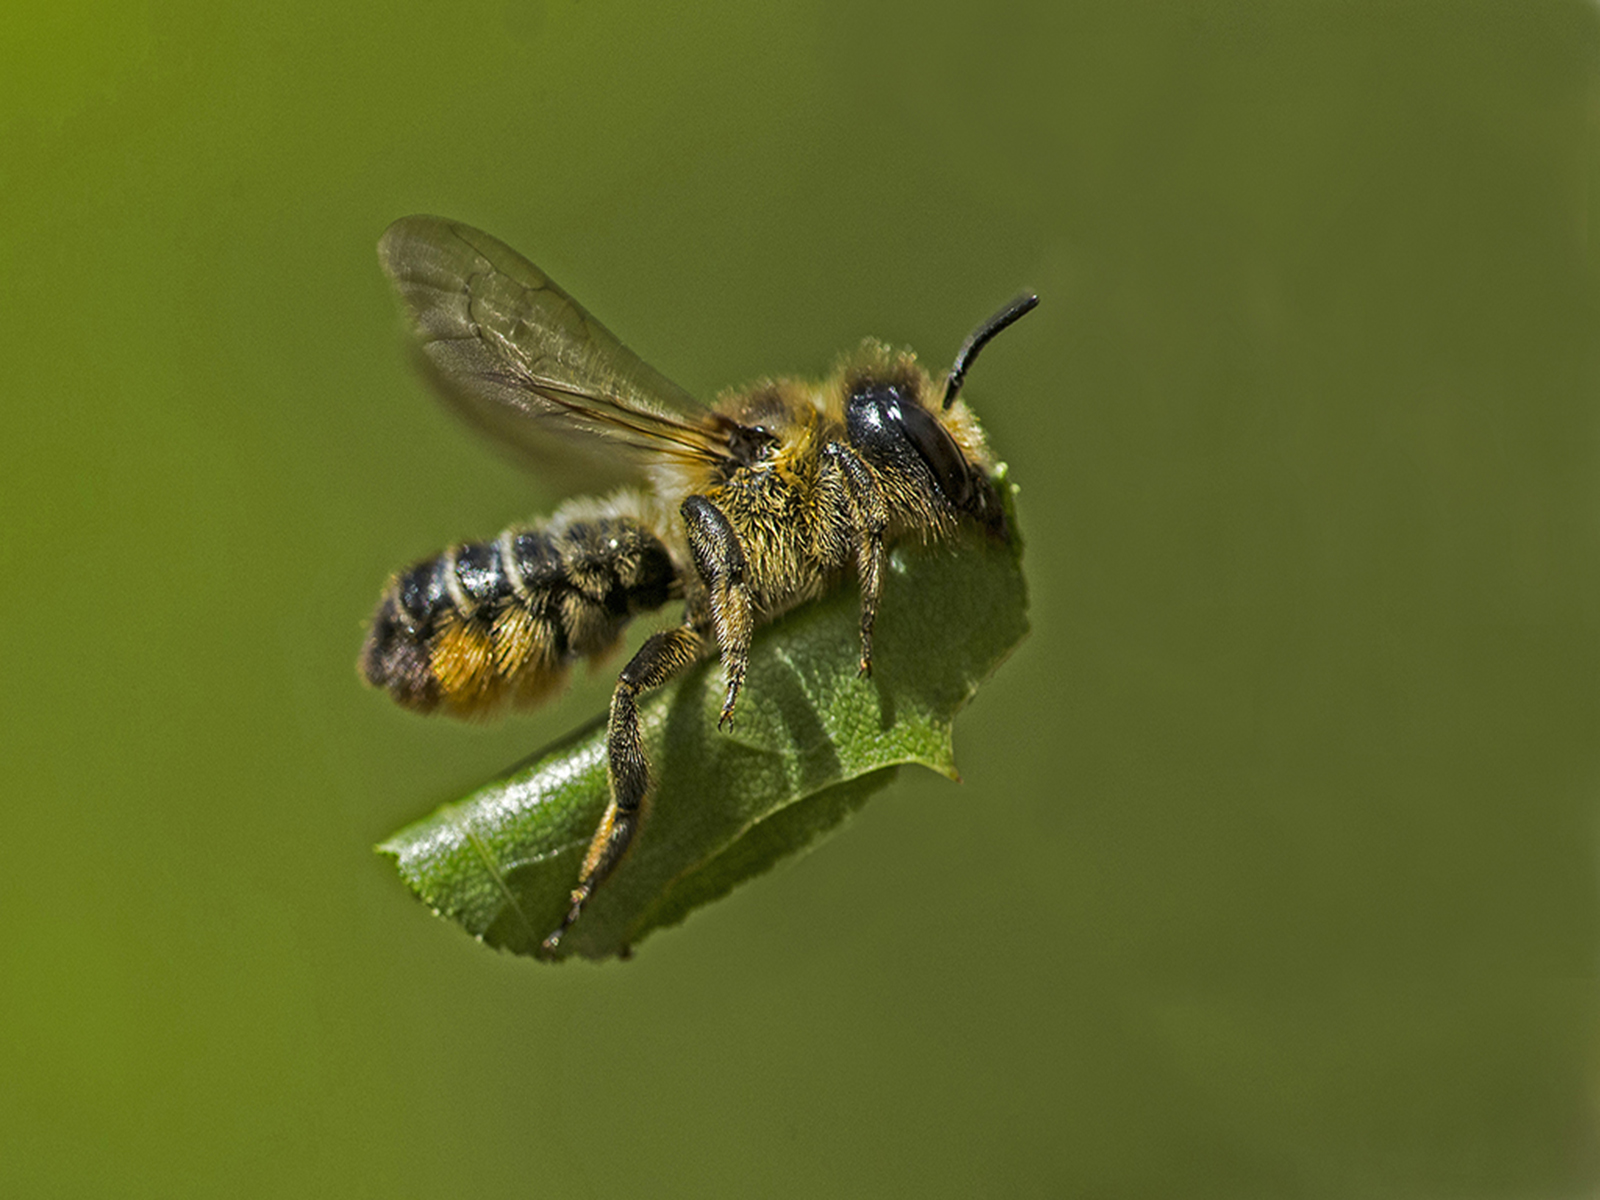 Leaf_Cutter_Bee%255B1%255D.jpg